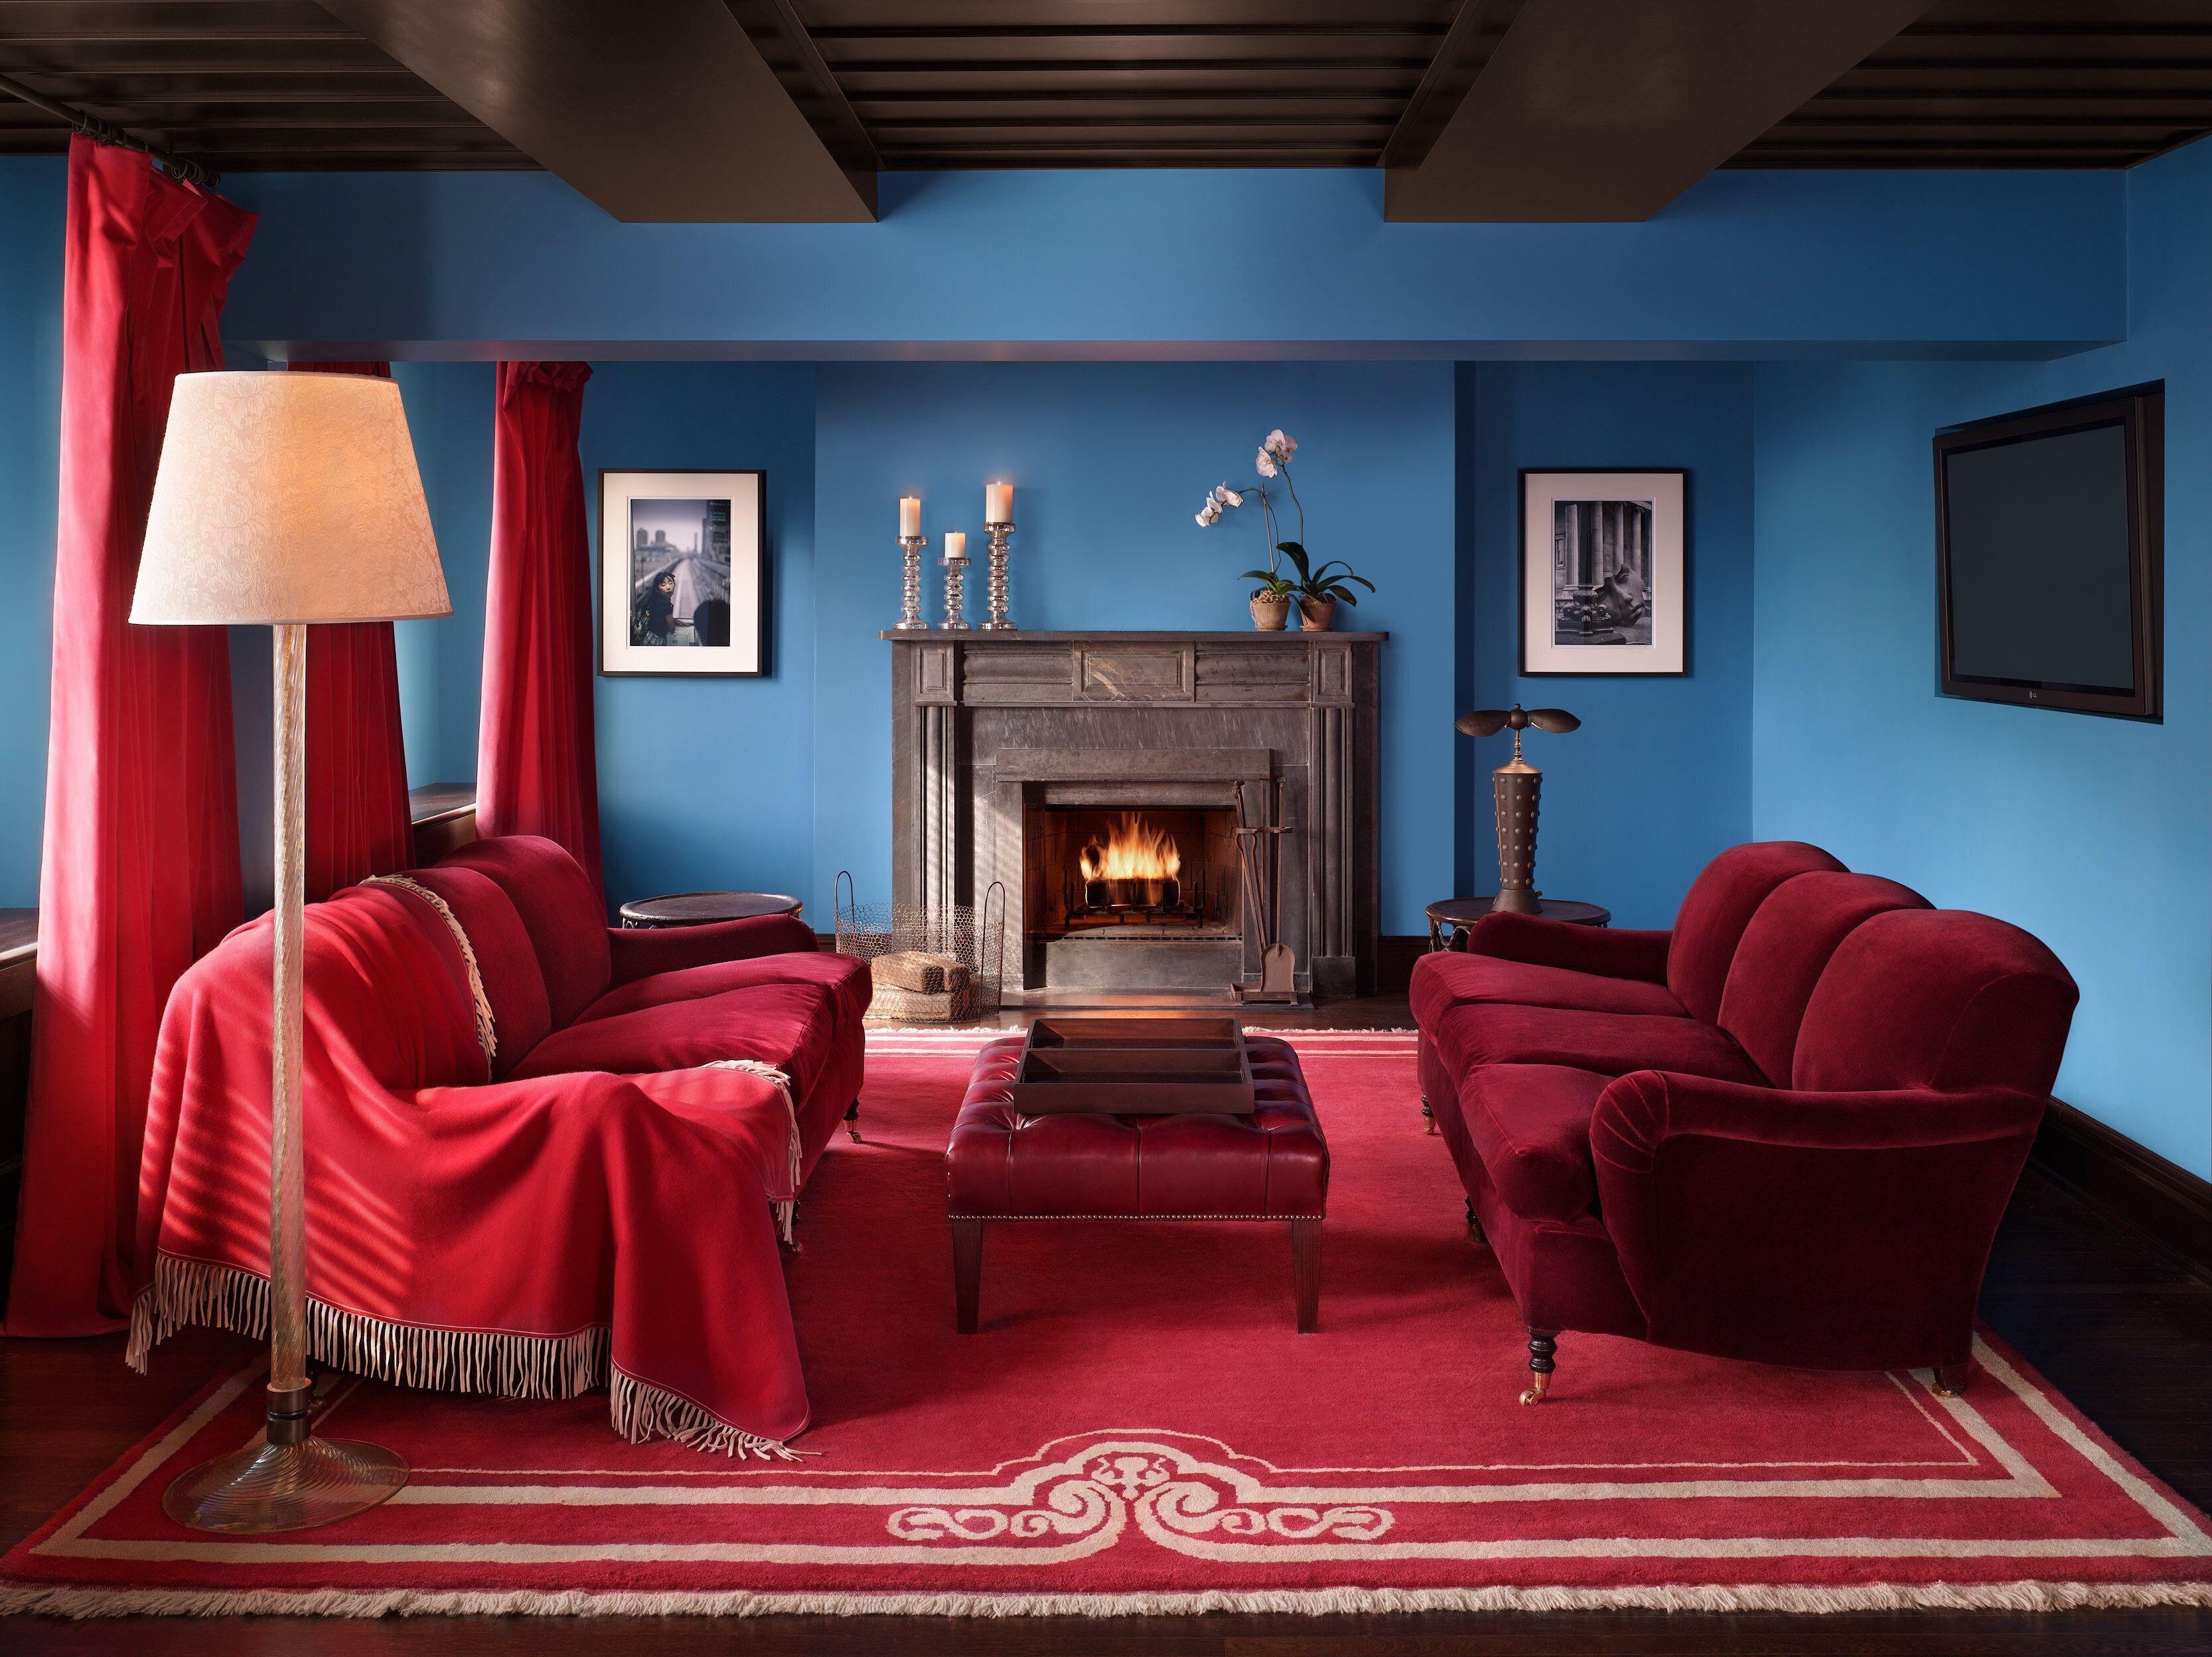 Courtesy of Gramercy Park Hotel / Expedia